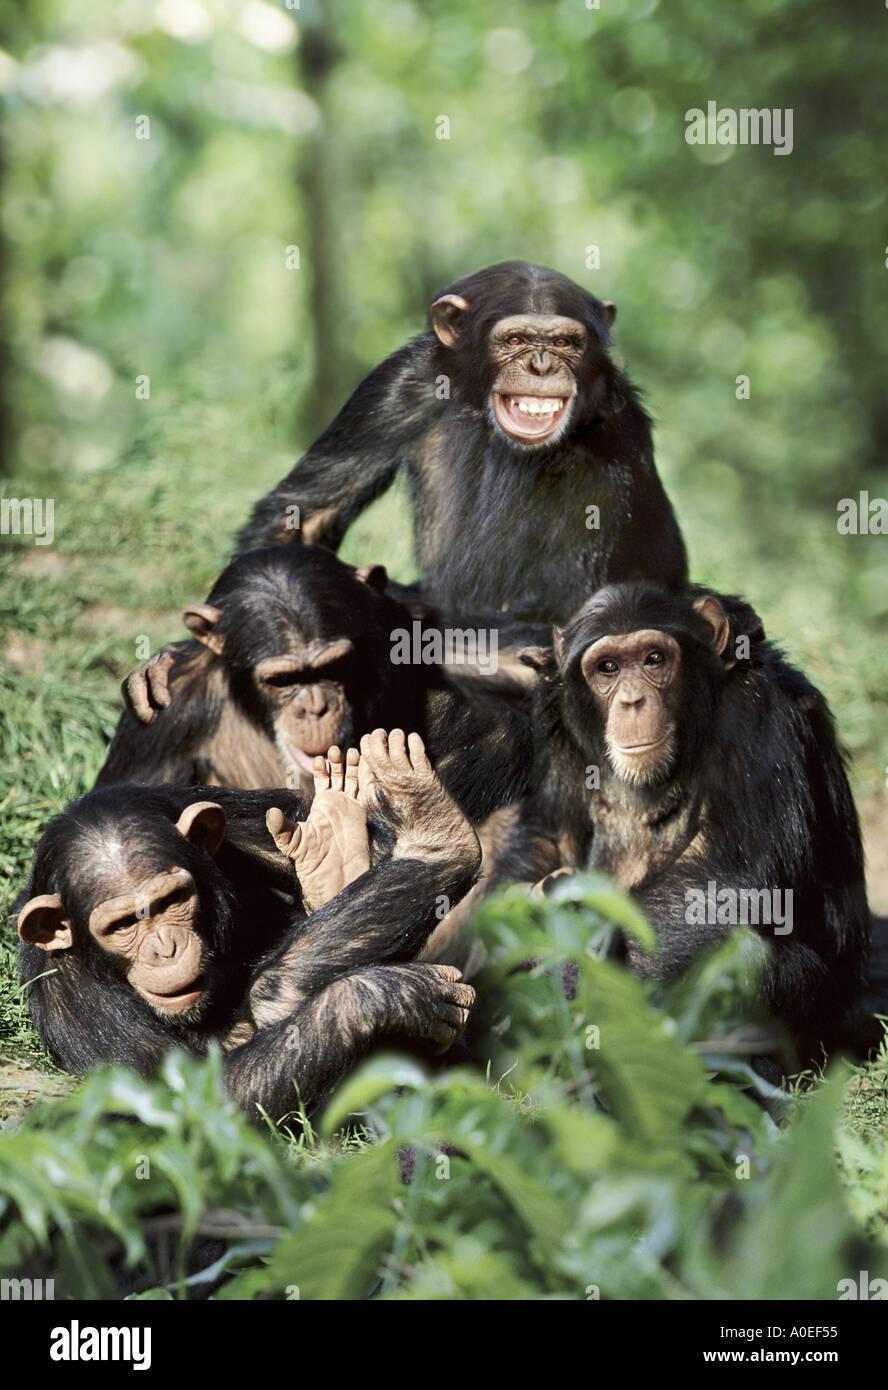 Grupo de chimpancés jugando Imagen De Stock